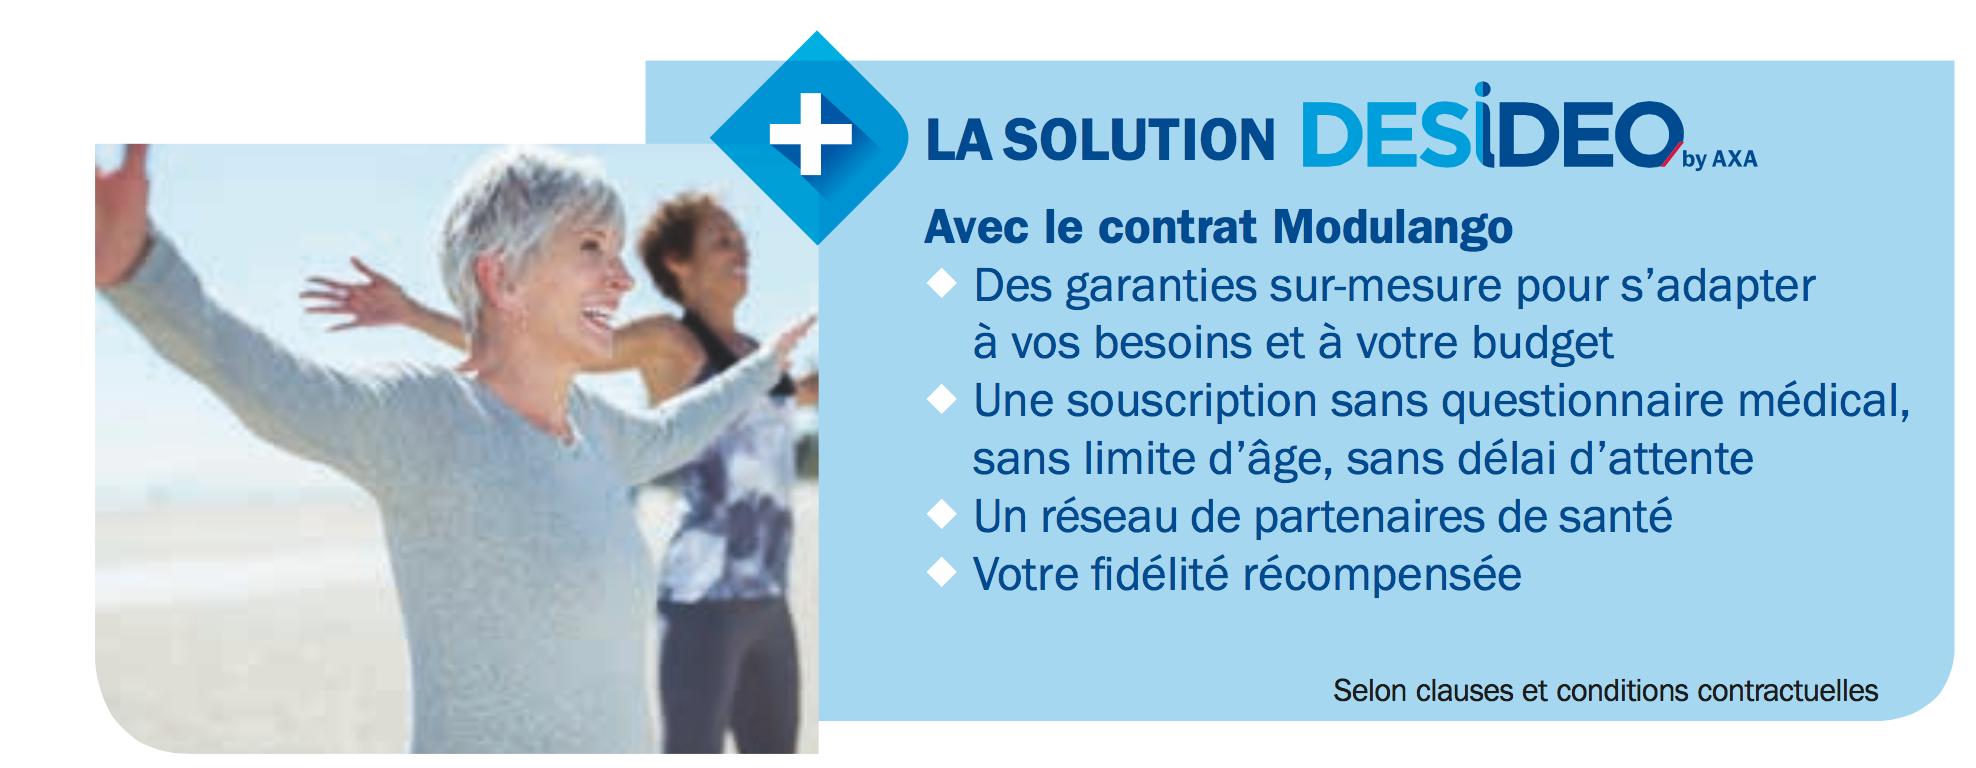 Solution santé AXA Désideo